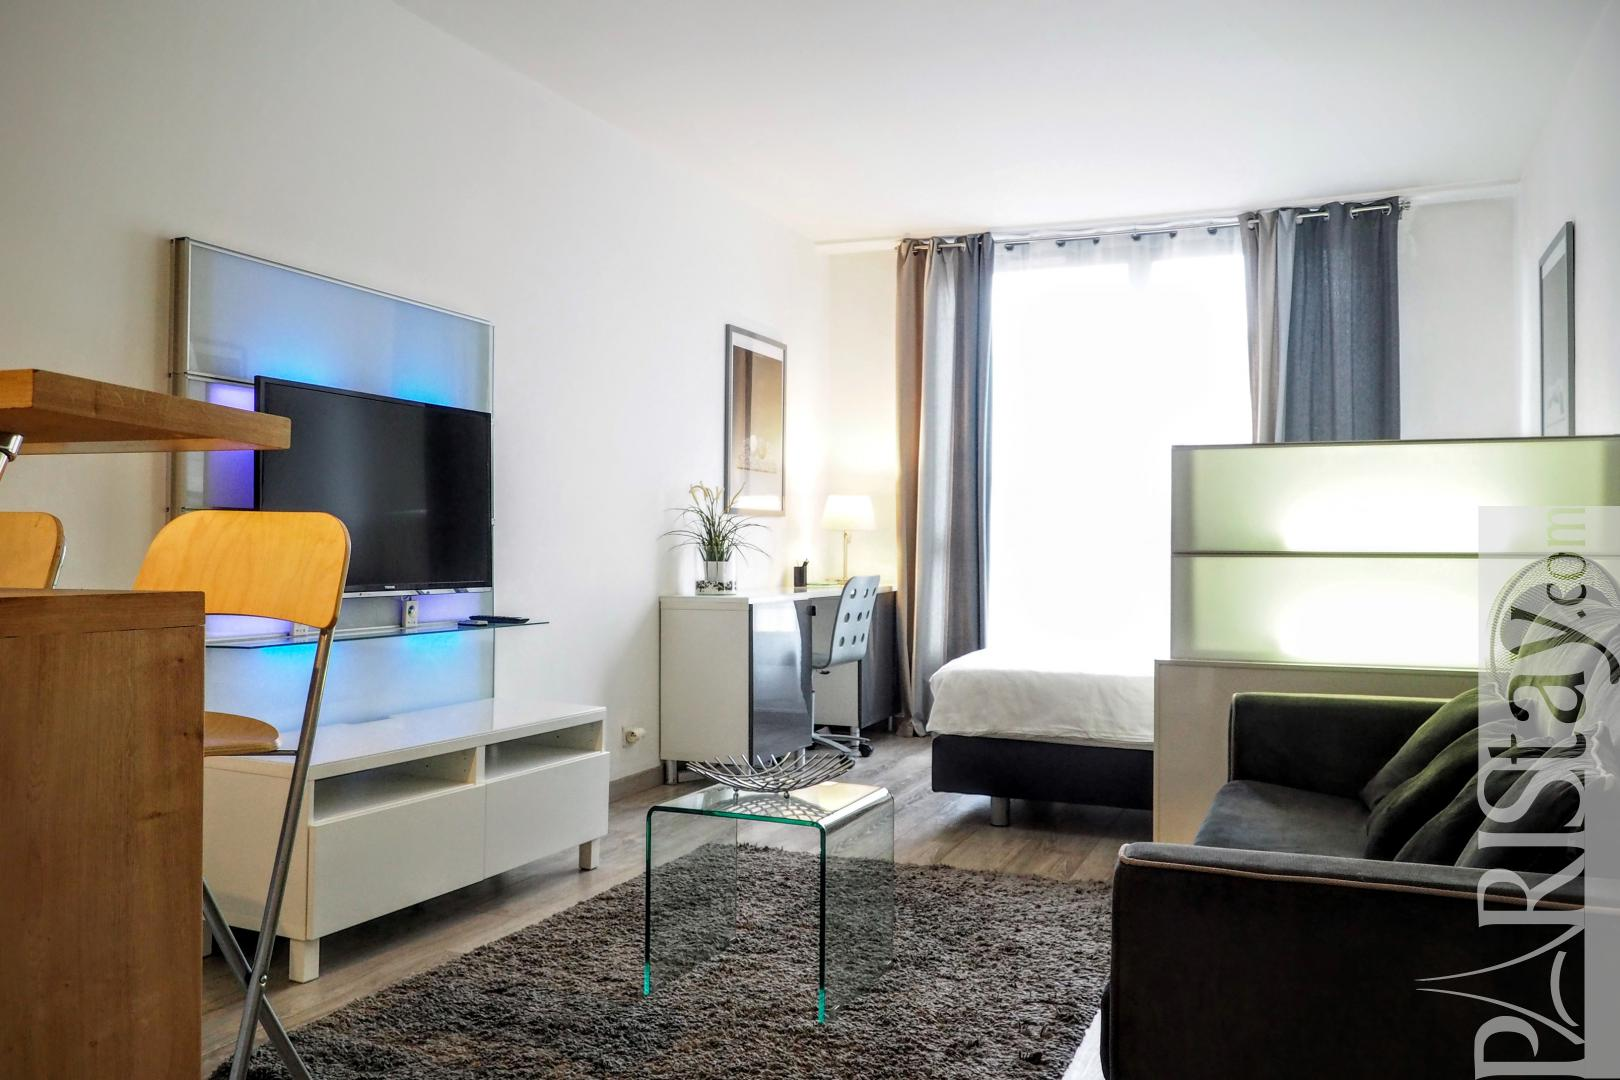 Location appartement paris t1 meuble trocadero - Location appartement paris meuble ...